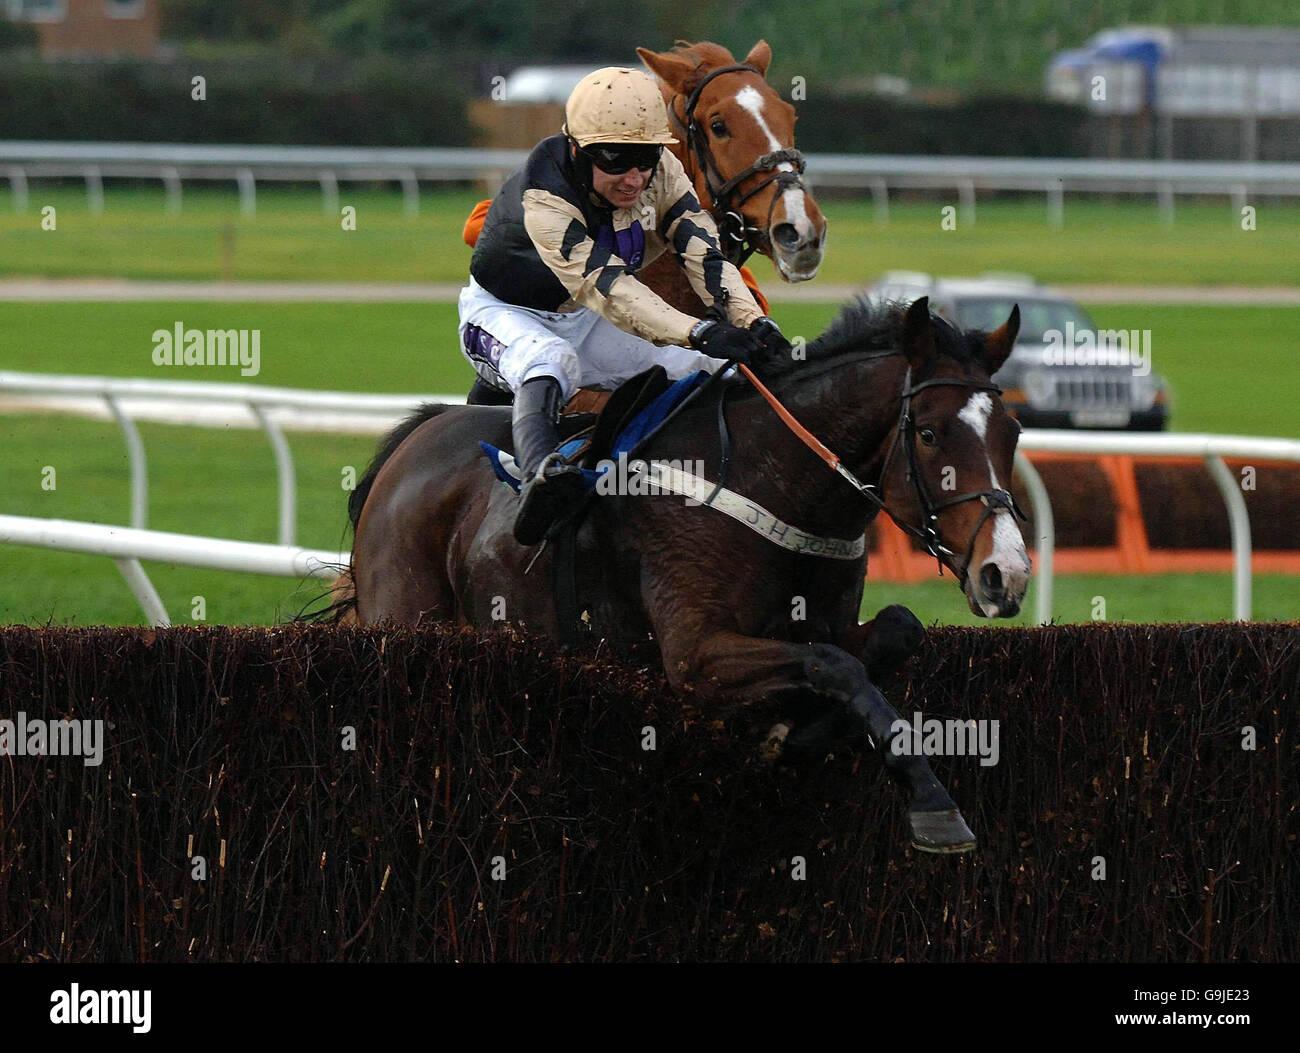 Racing - Weatherby Stock Photo